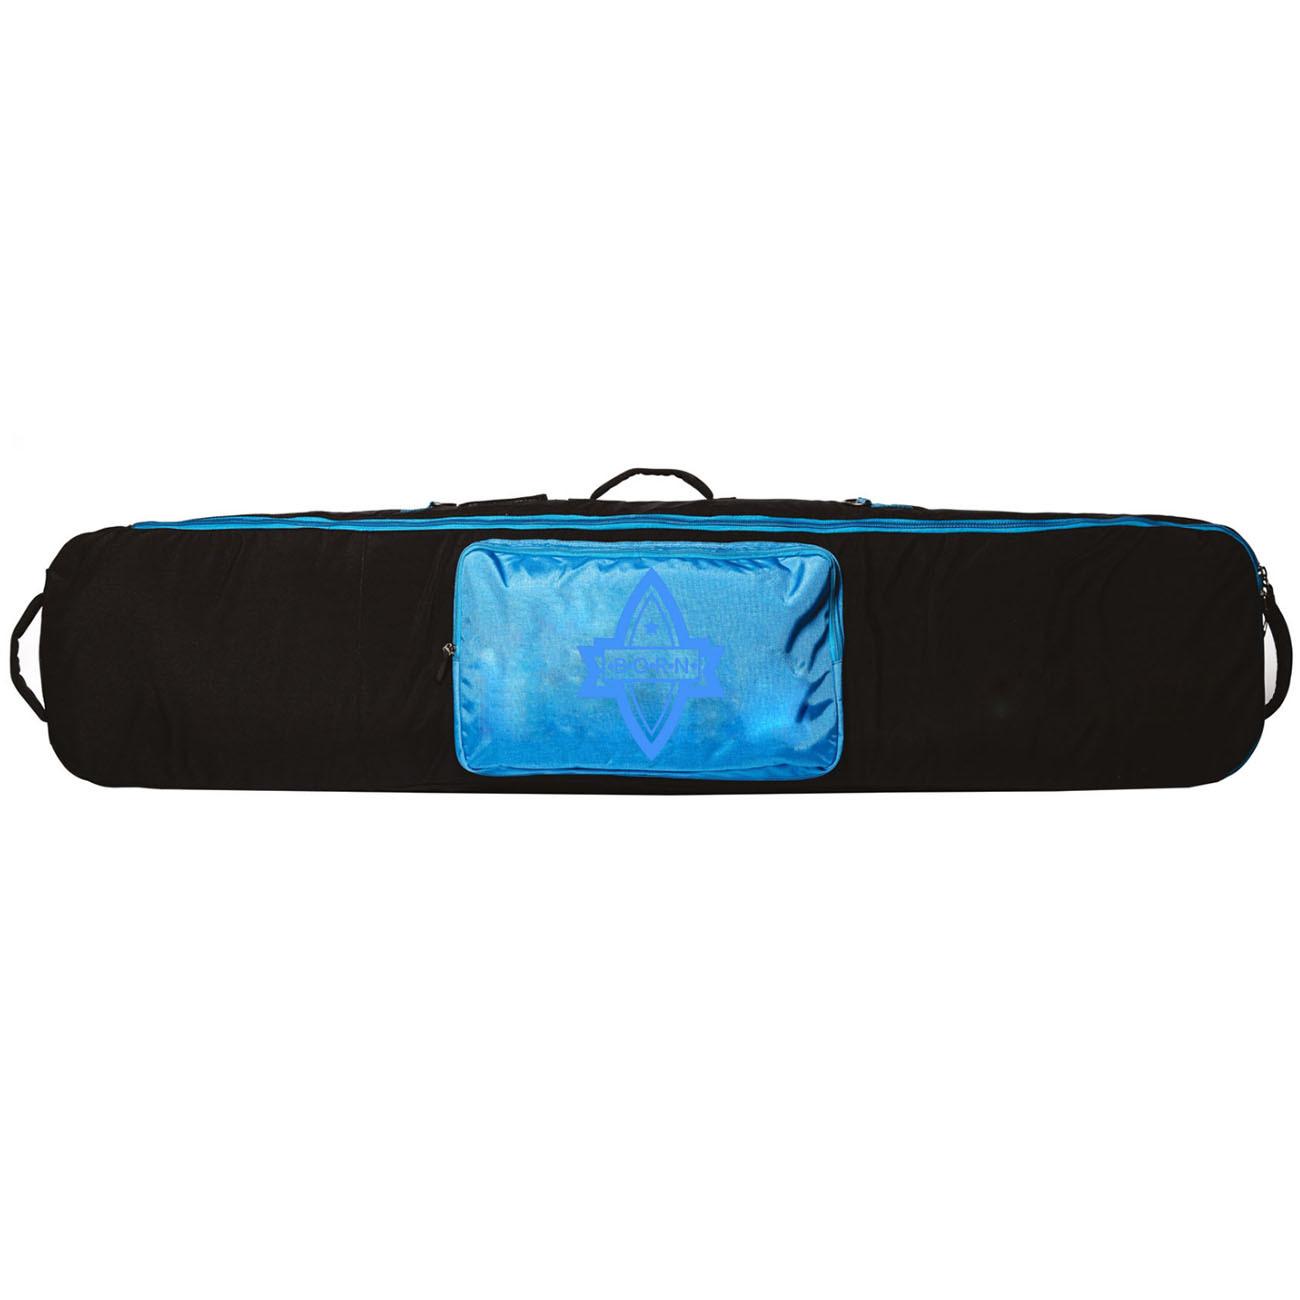 Сноуборд/Лыжи Чехол для сноуборда Born без колес 156/166 см Черный/голубой (0099290) BORN_11.jpg